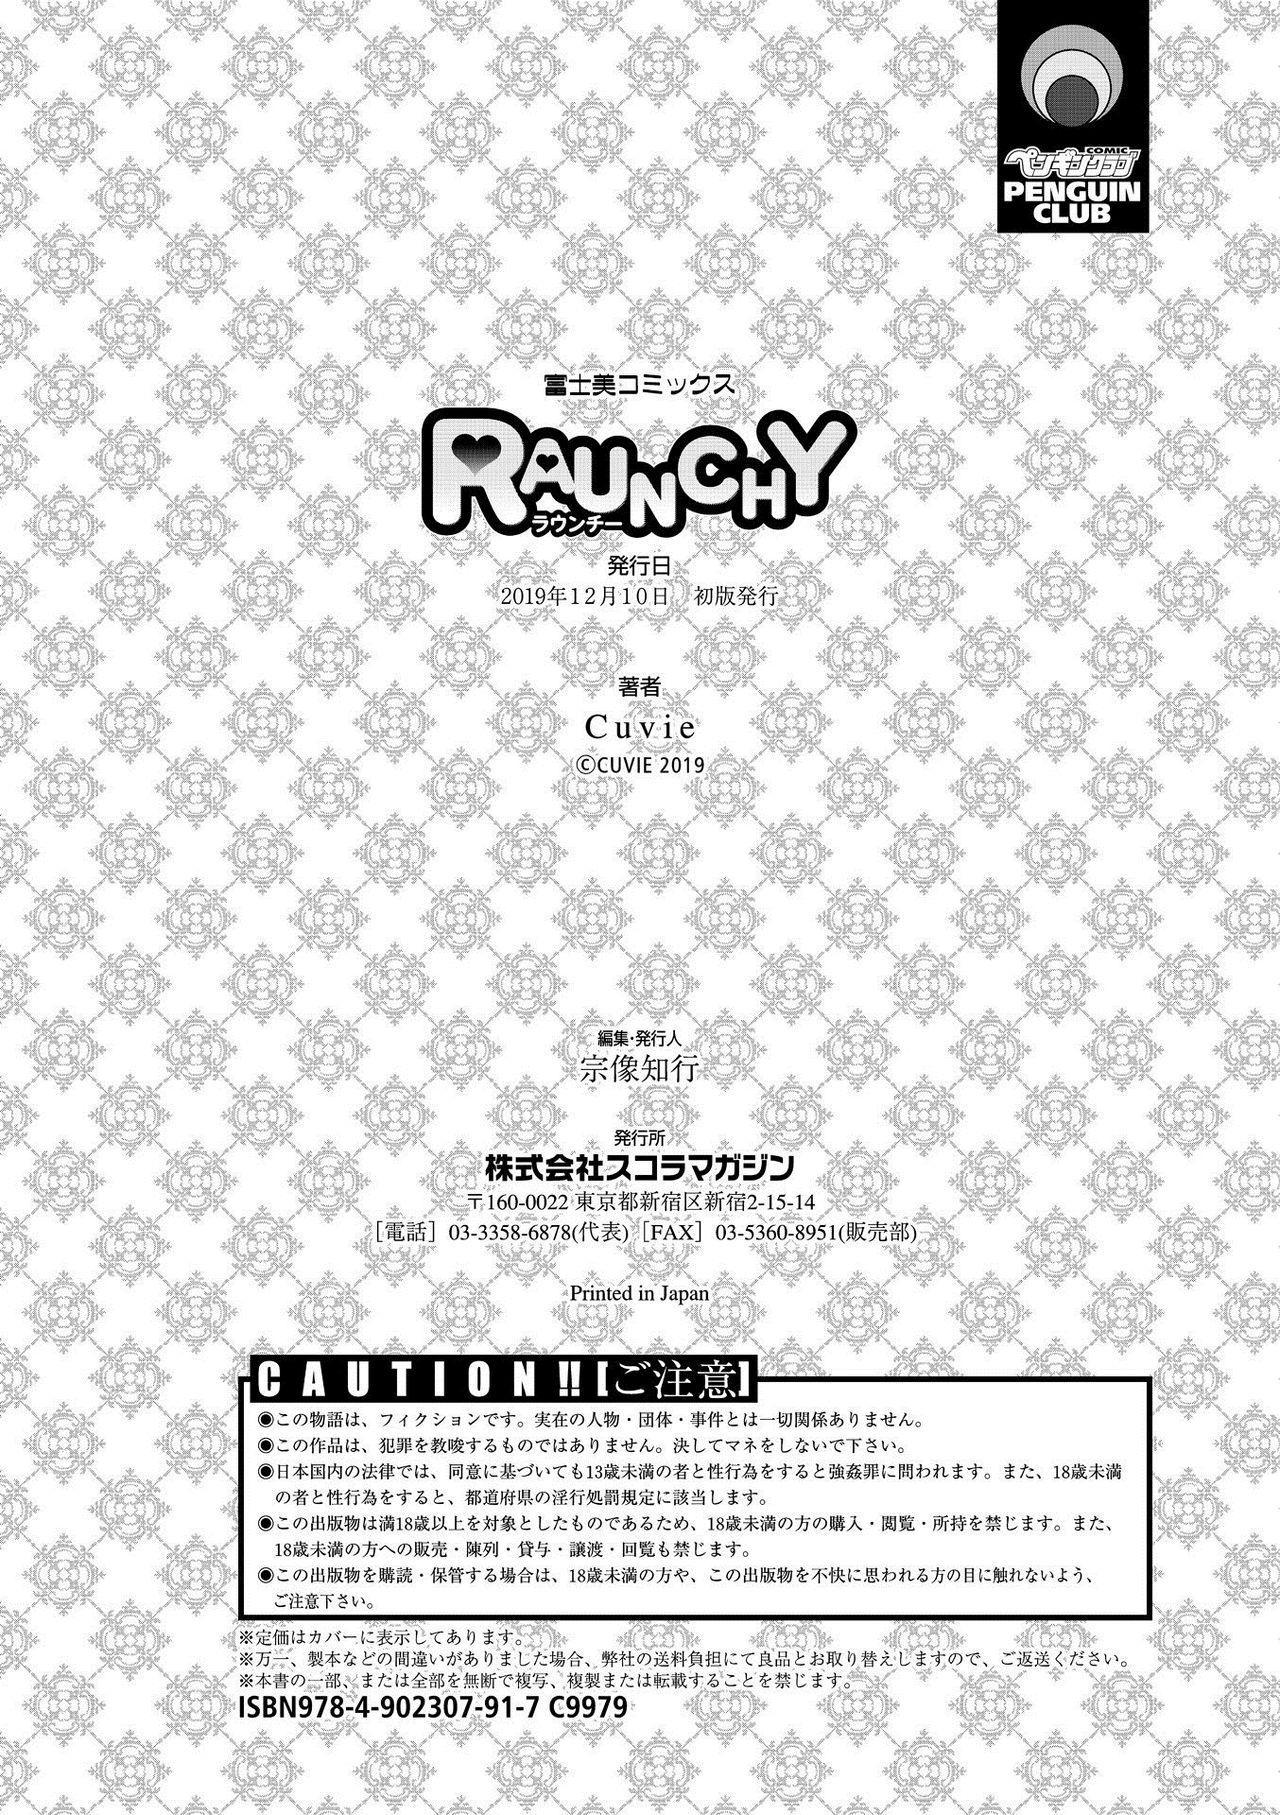 RAUNCHY 243